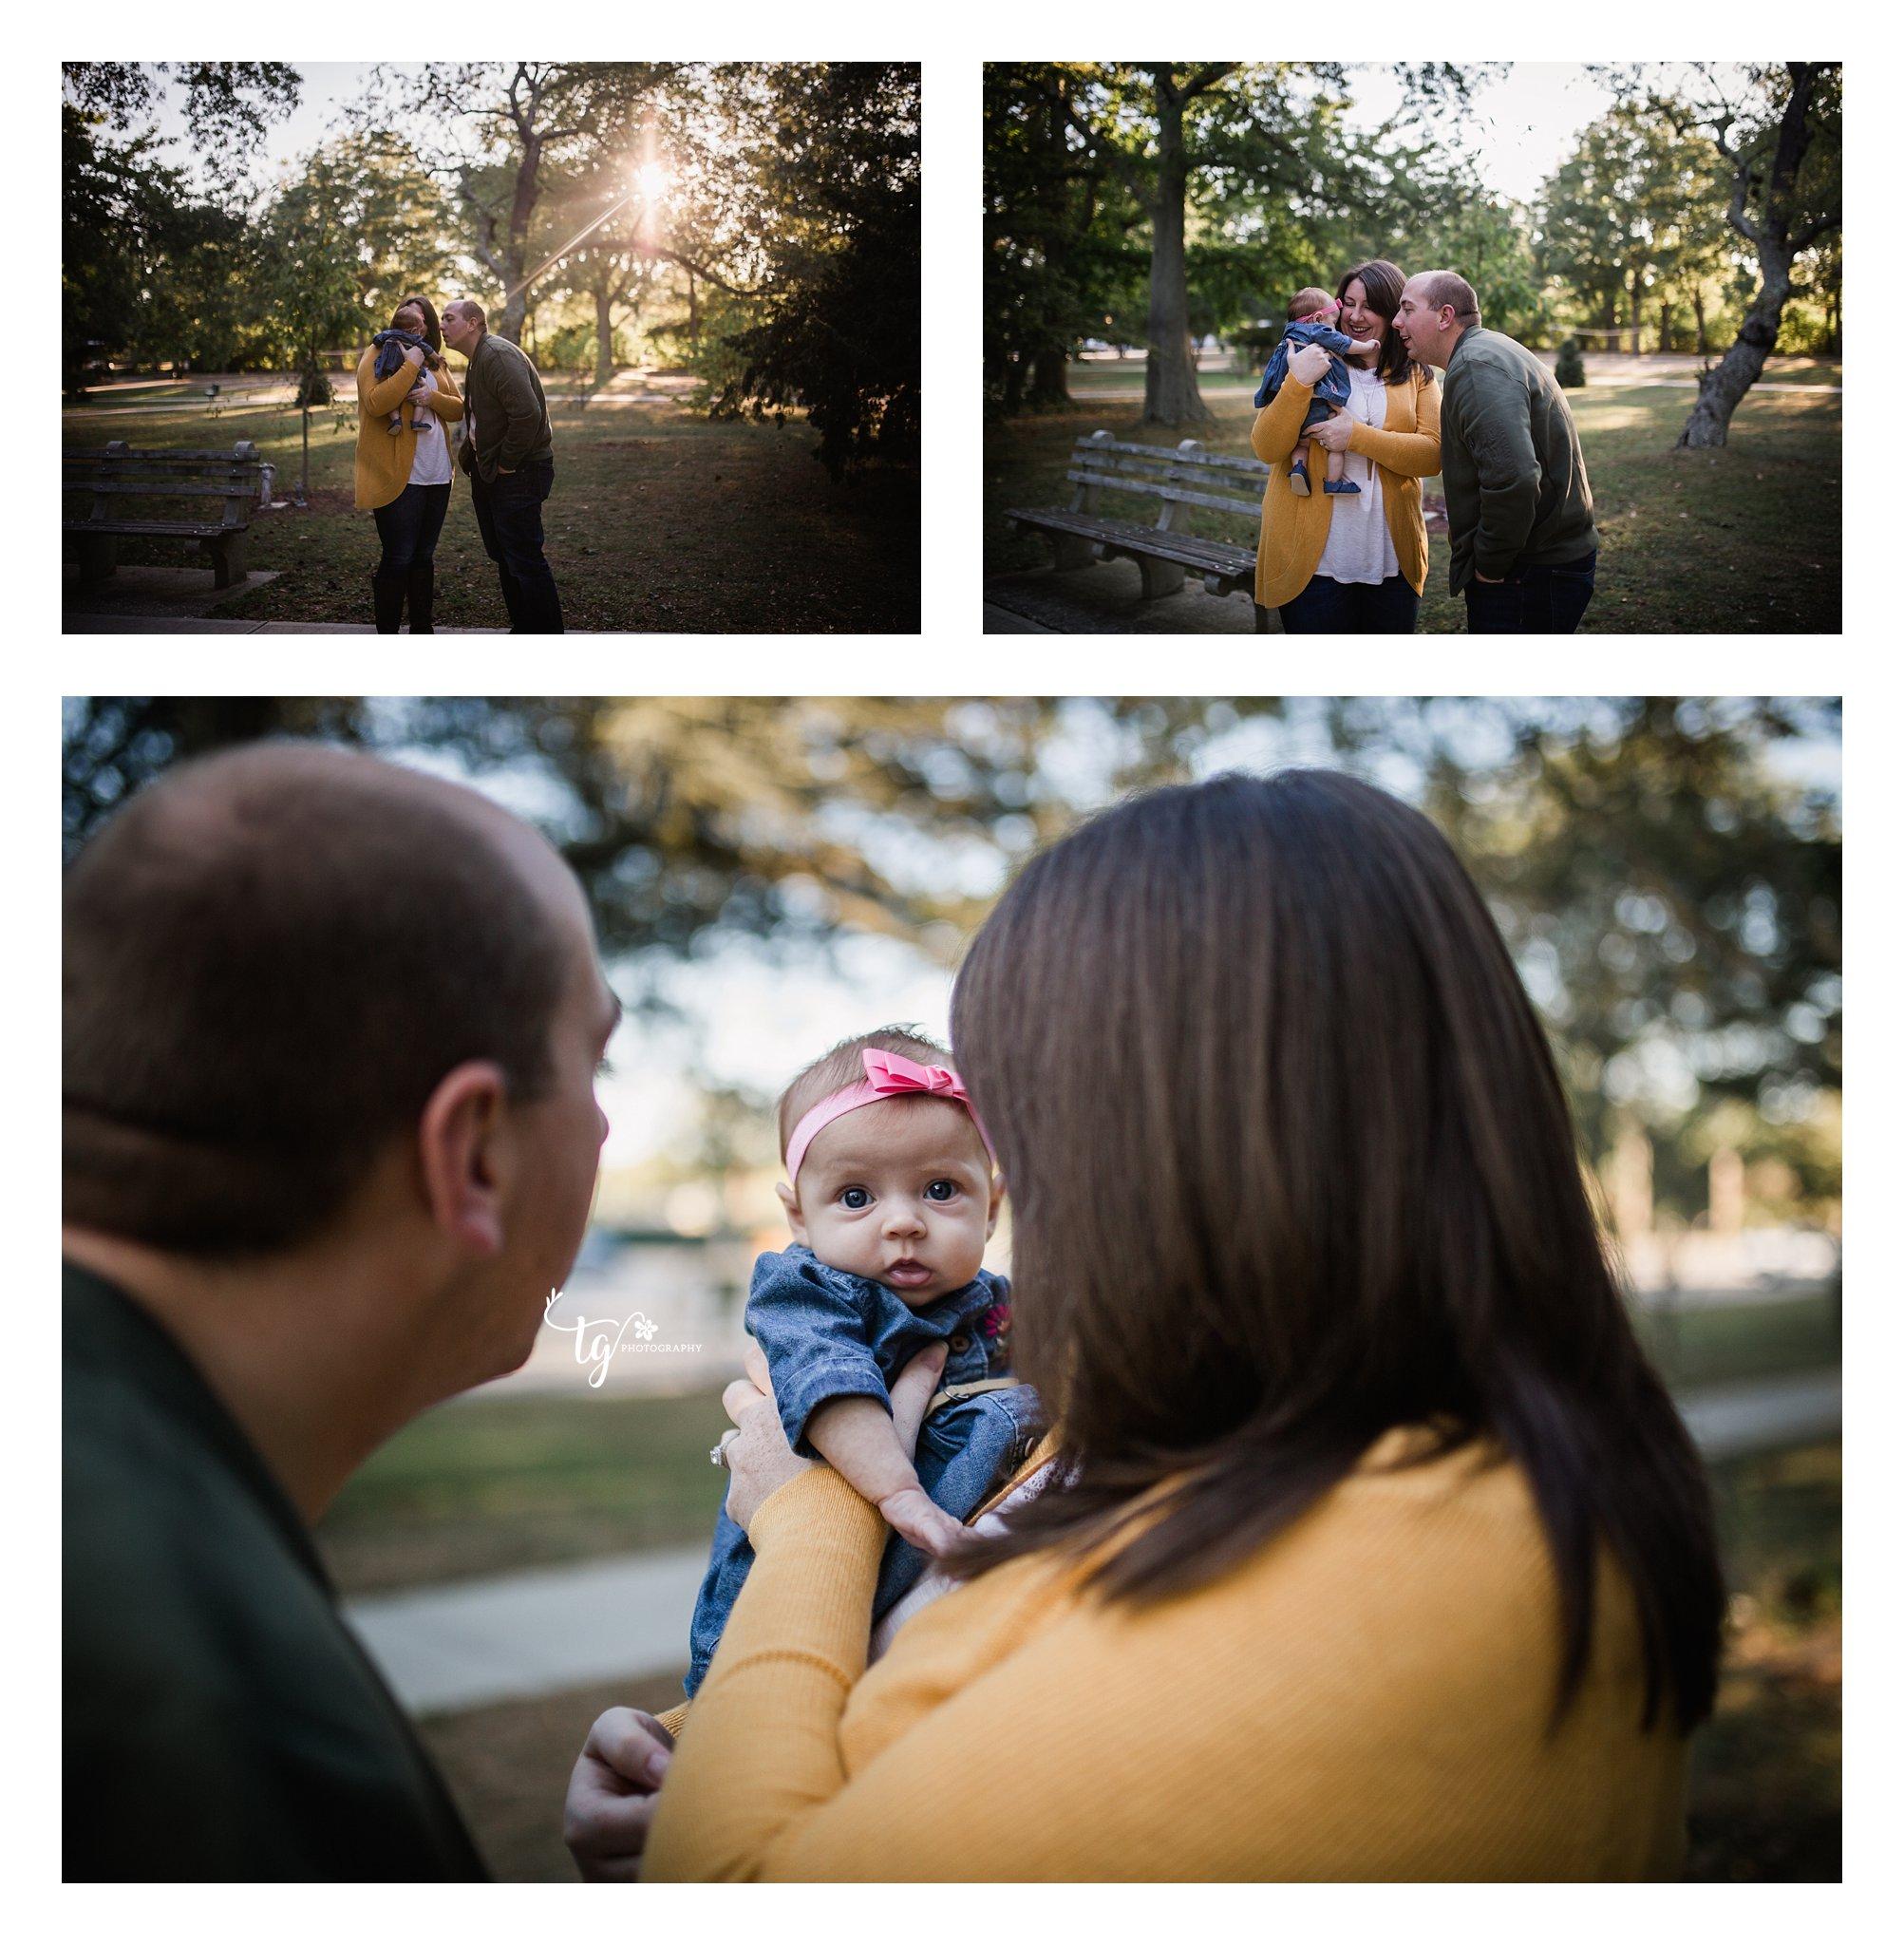 Fall family park photographer